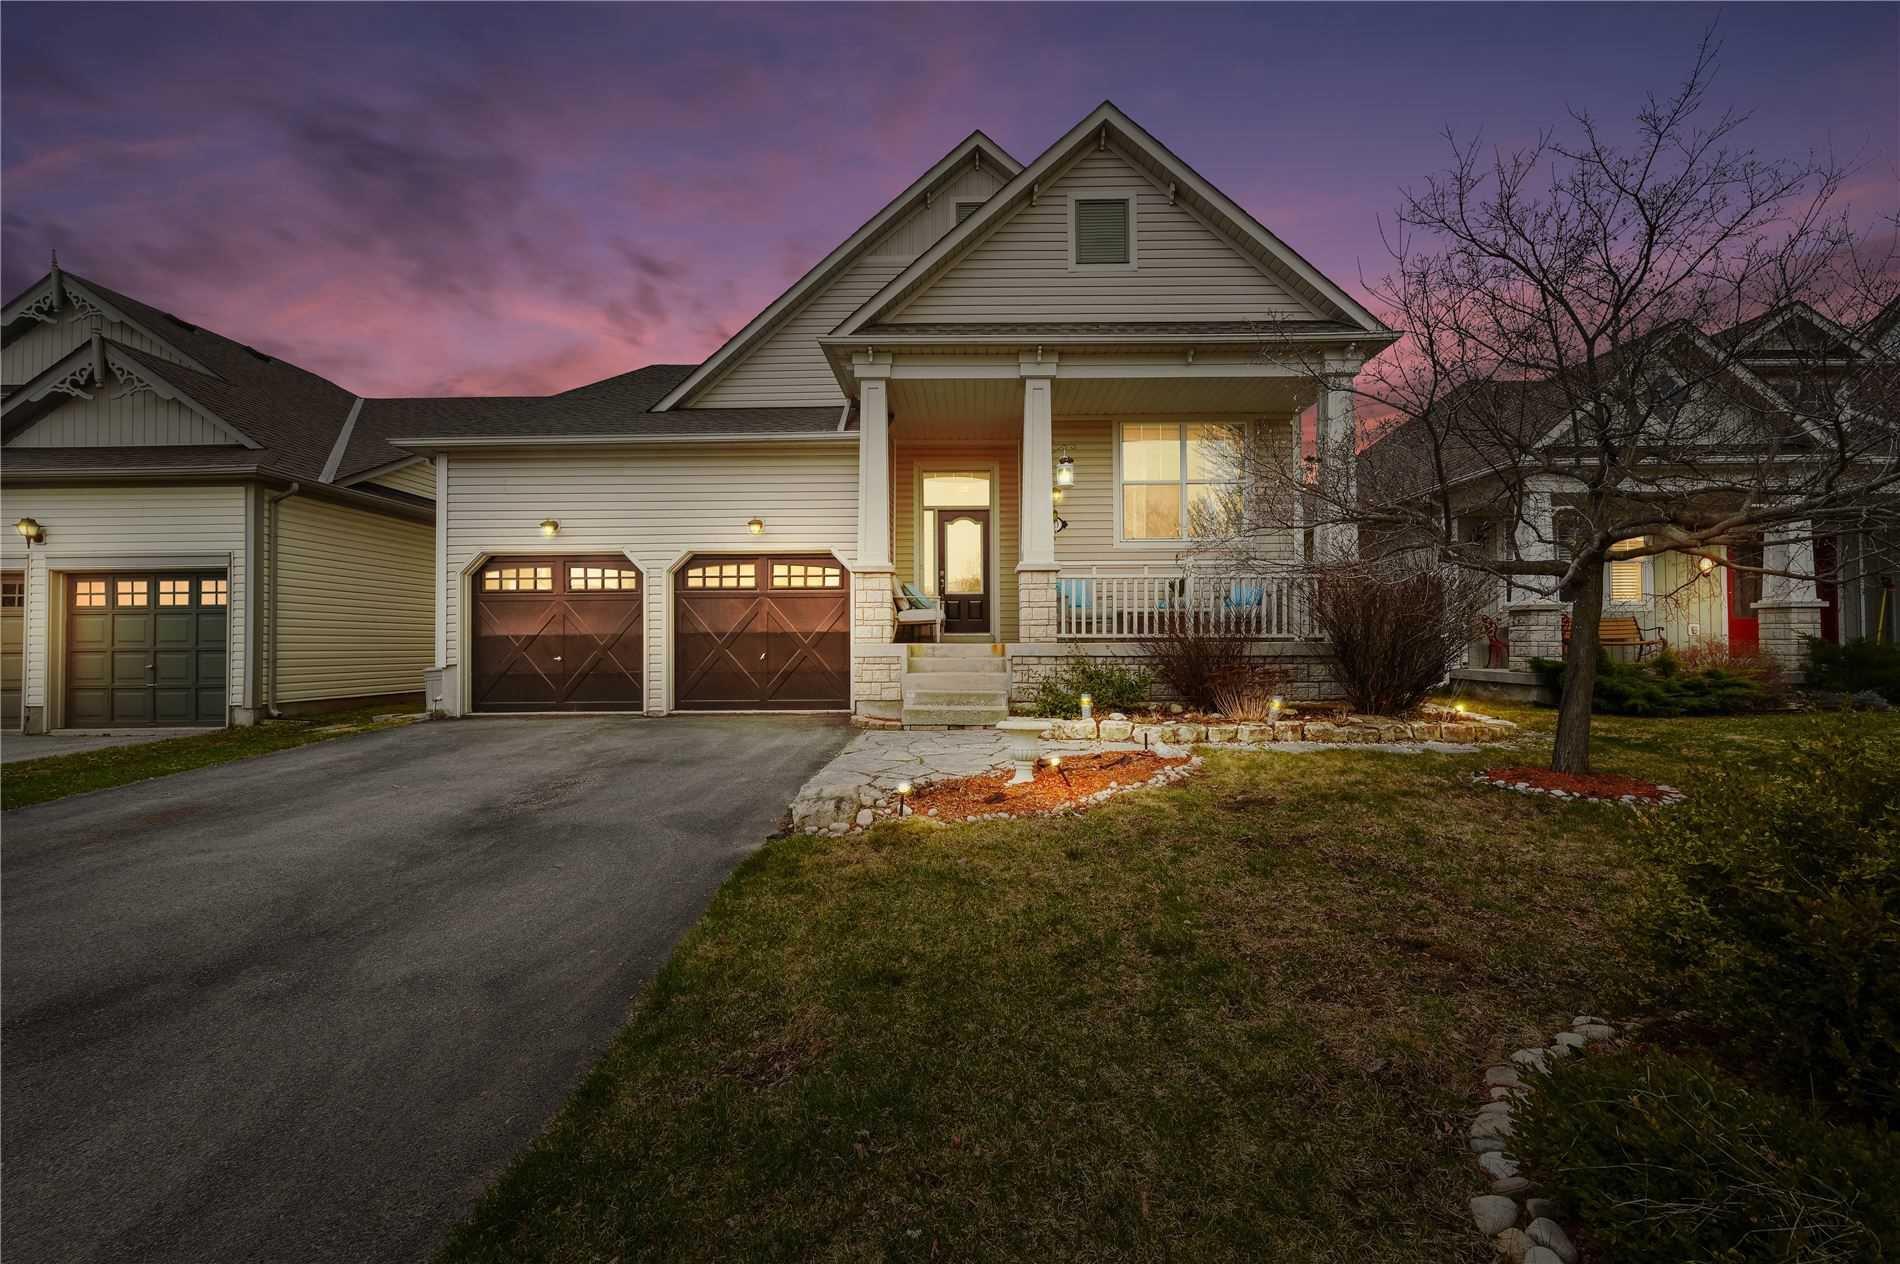 Main Photo: 30 Somerville Road in Halton Hills: Acton House (Bungalow) for sale : MLS®# W4744837